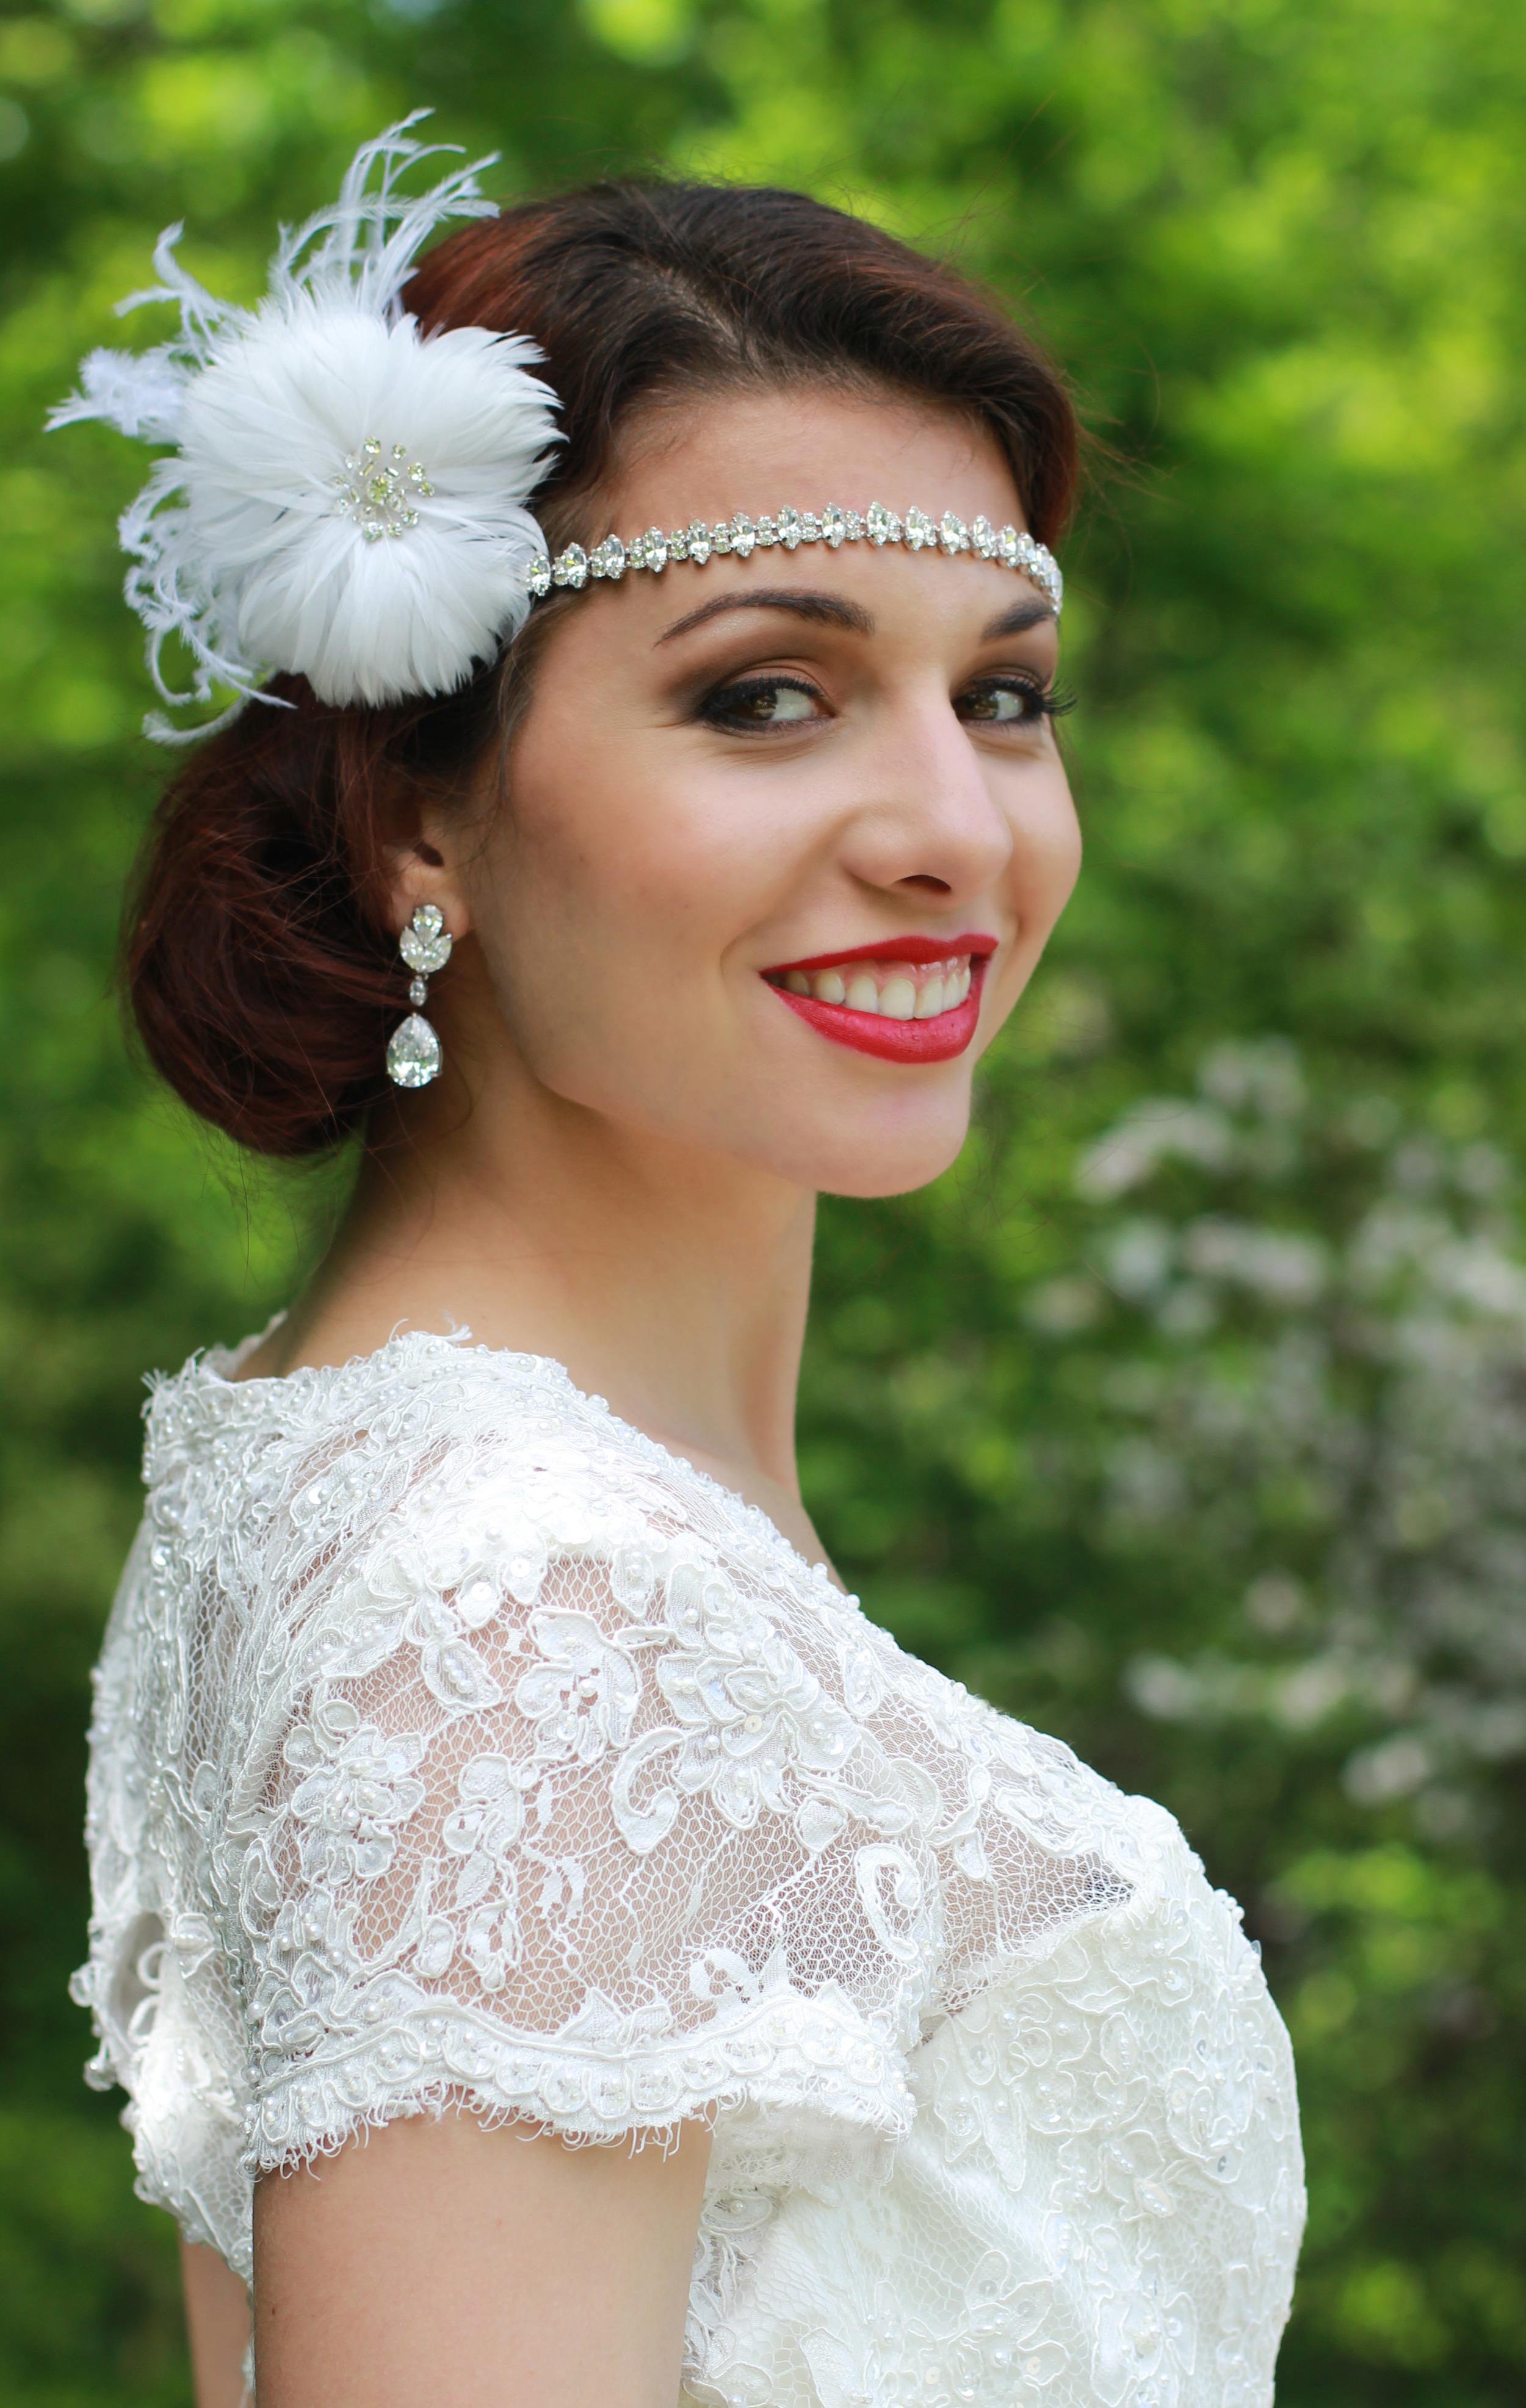 Vintage Glamour Wedding | Bride | Brookside Gardens - Jess Rudolph Photography: www.jessrudolph.com